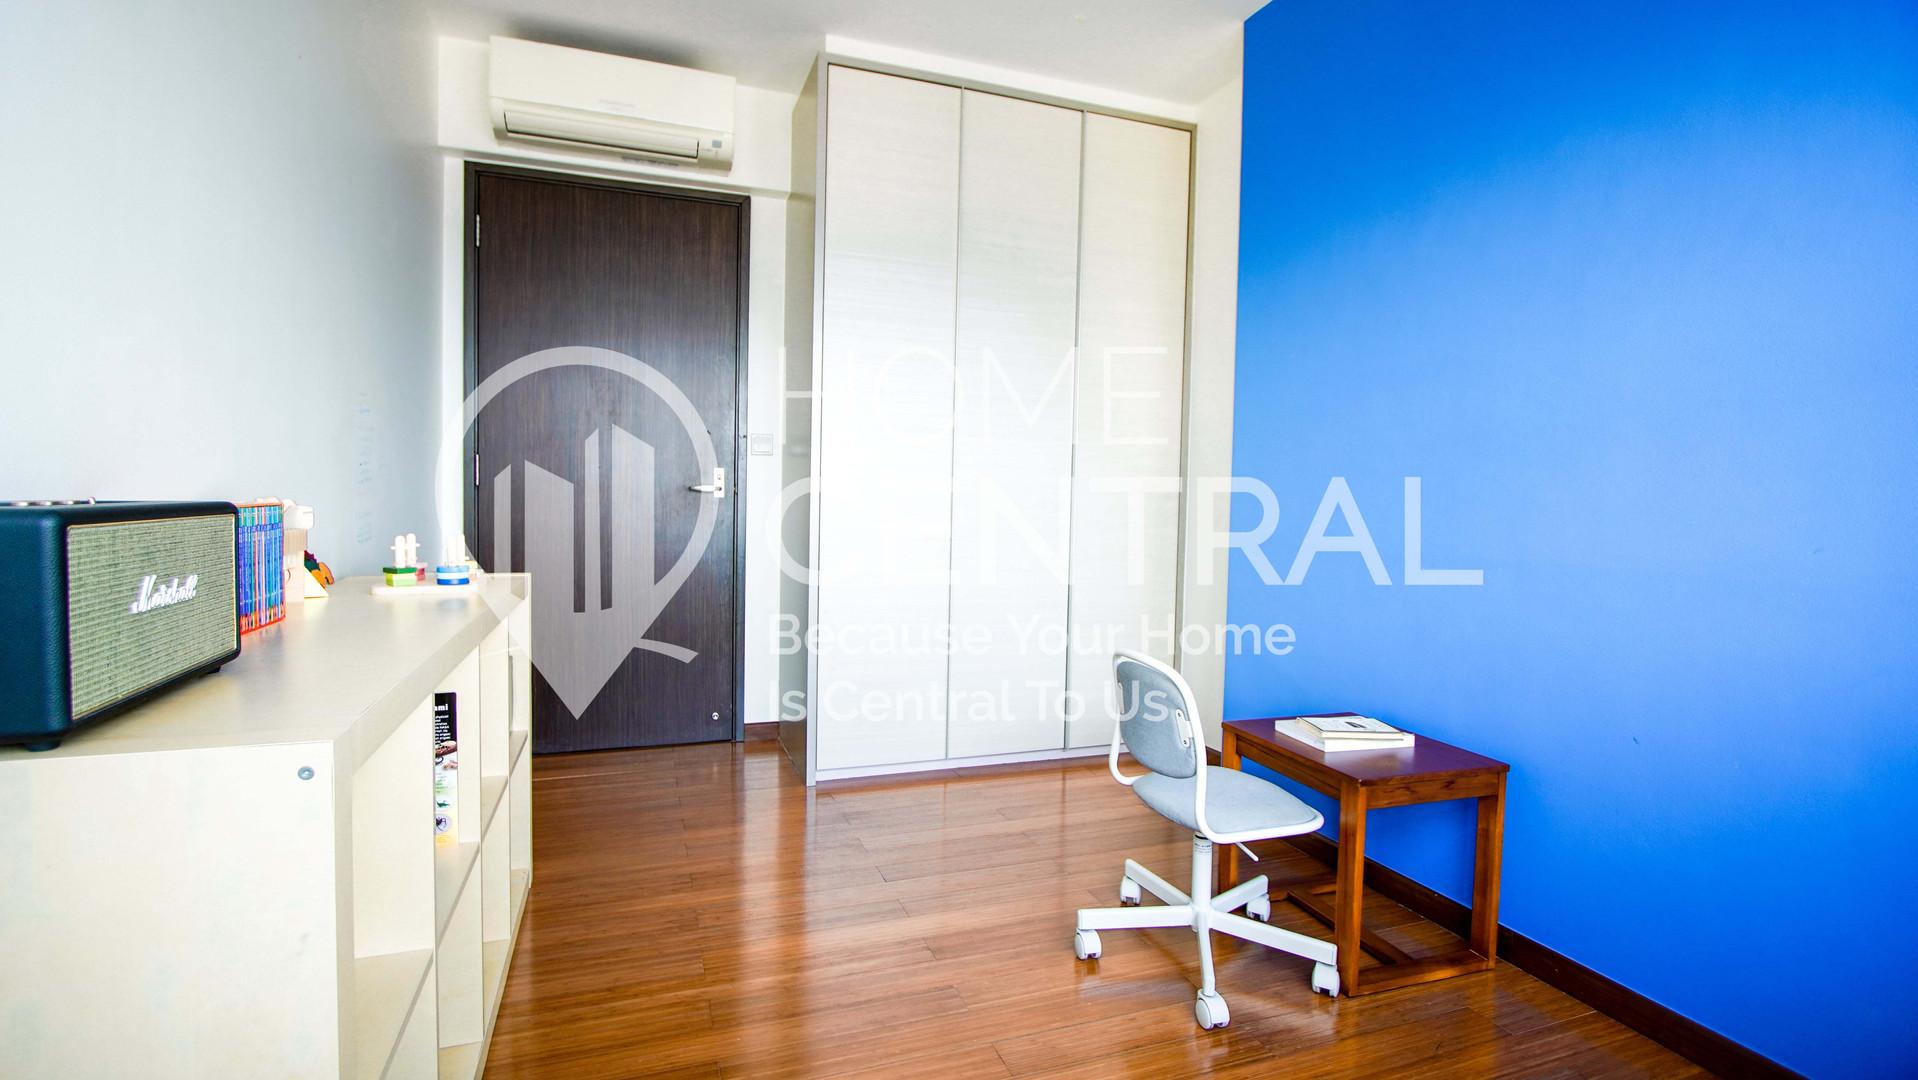 19 Bedroom 1-3 DSC02458-HDR-min.jpg